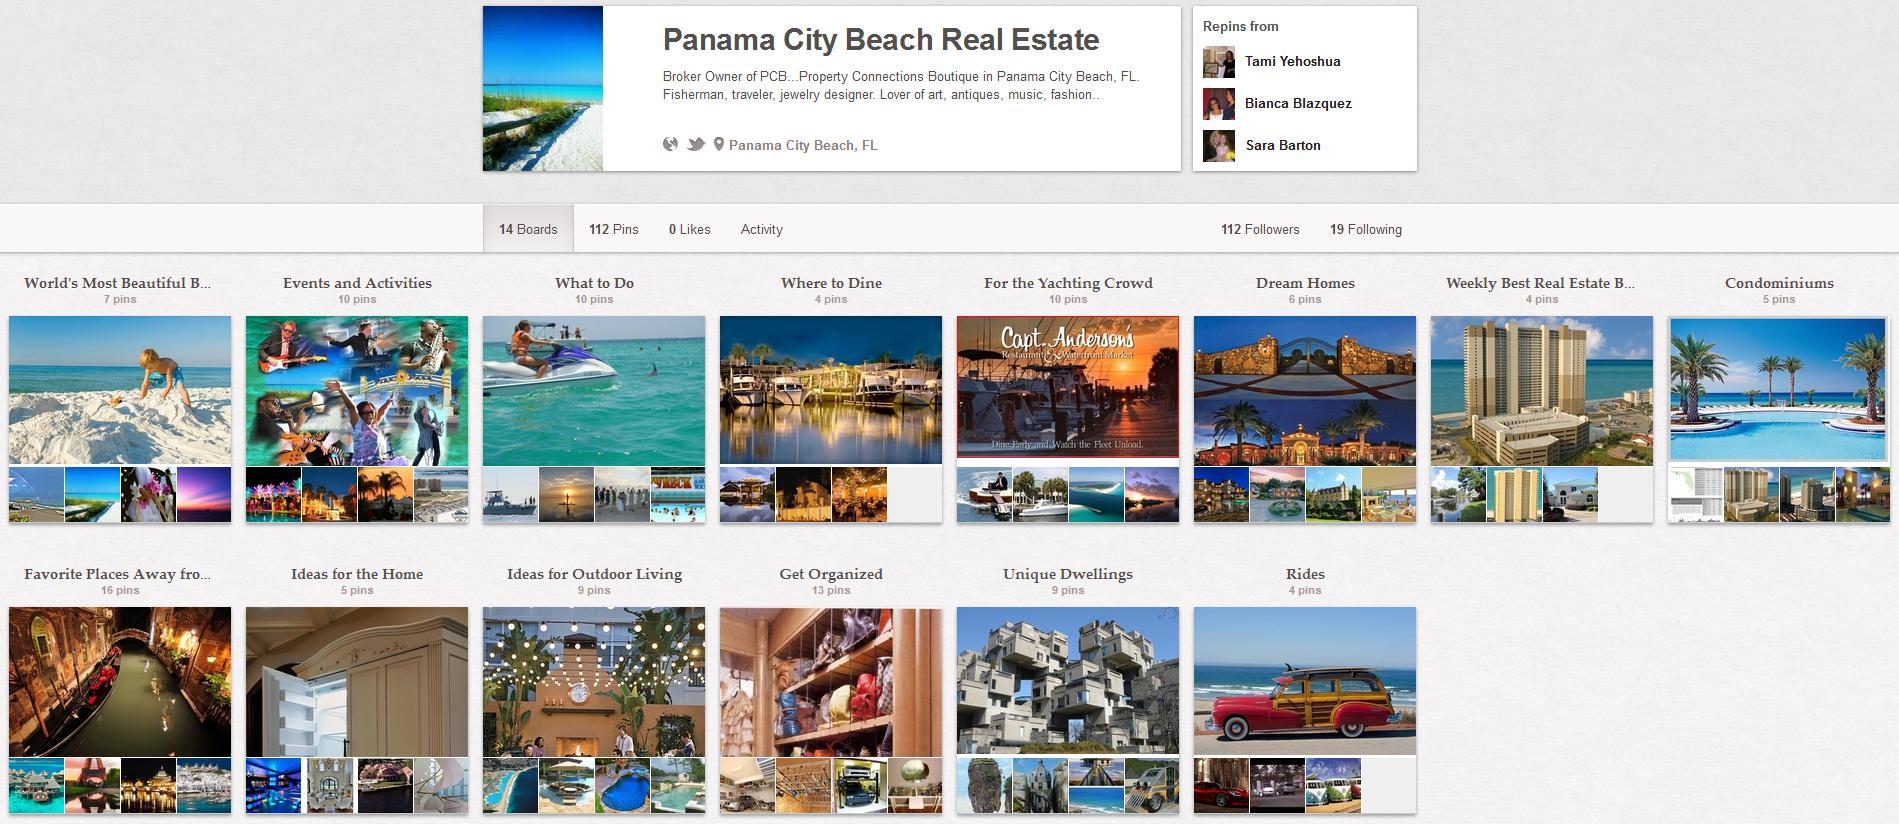 Southern Exposures Panama City Beach